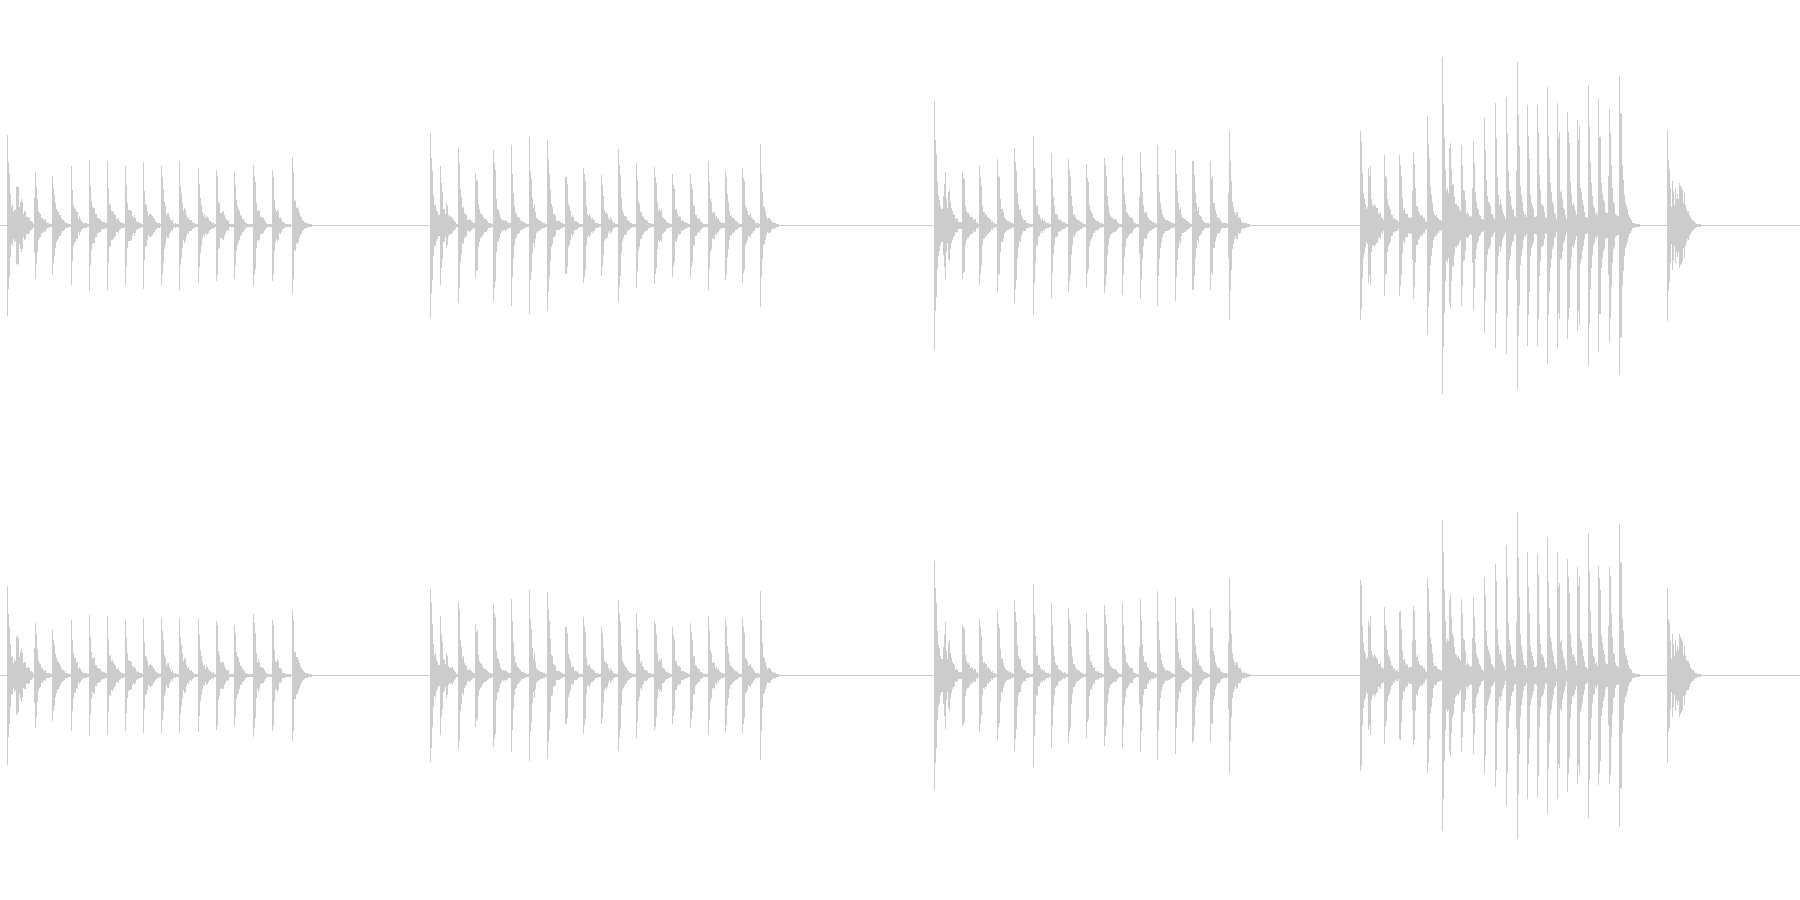 大太鼓22山ヲロシ歌舞伎情景描写和風和太の未再生の波形